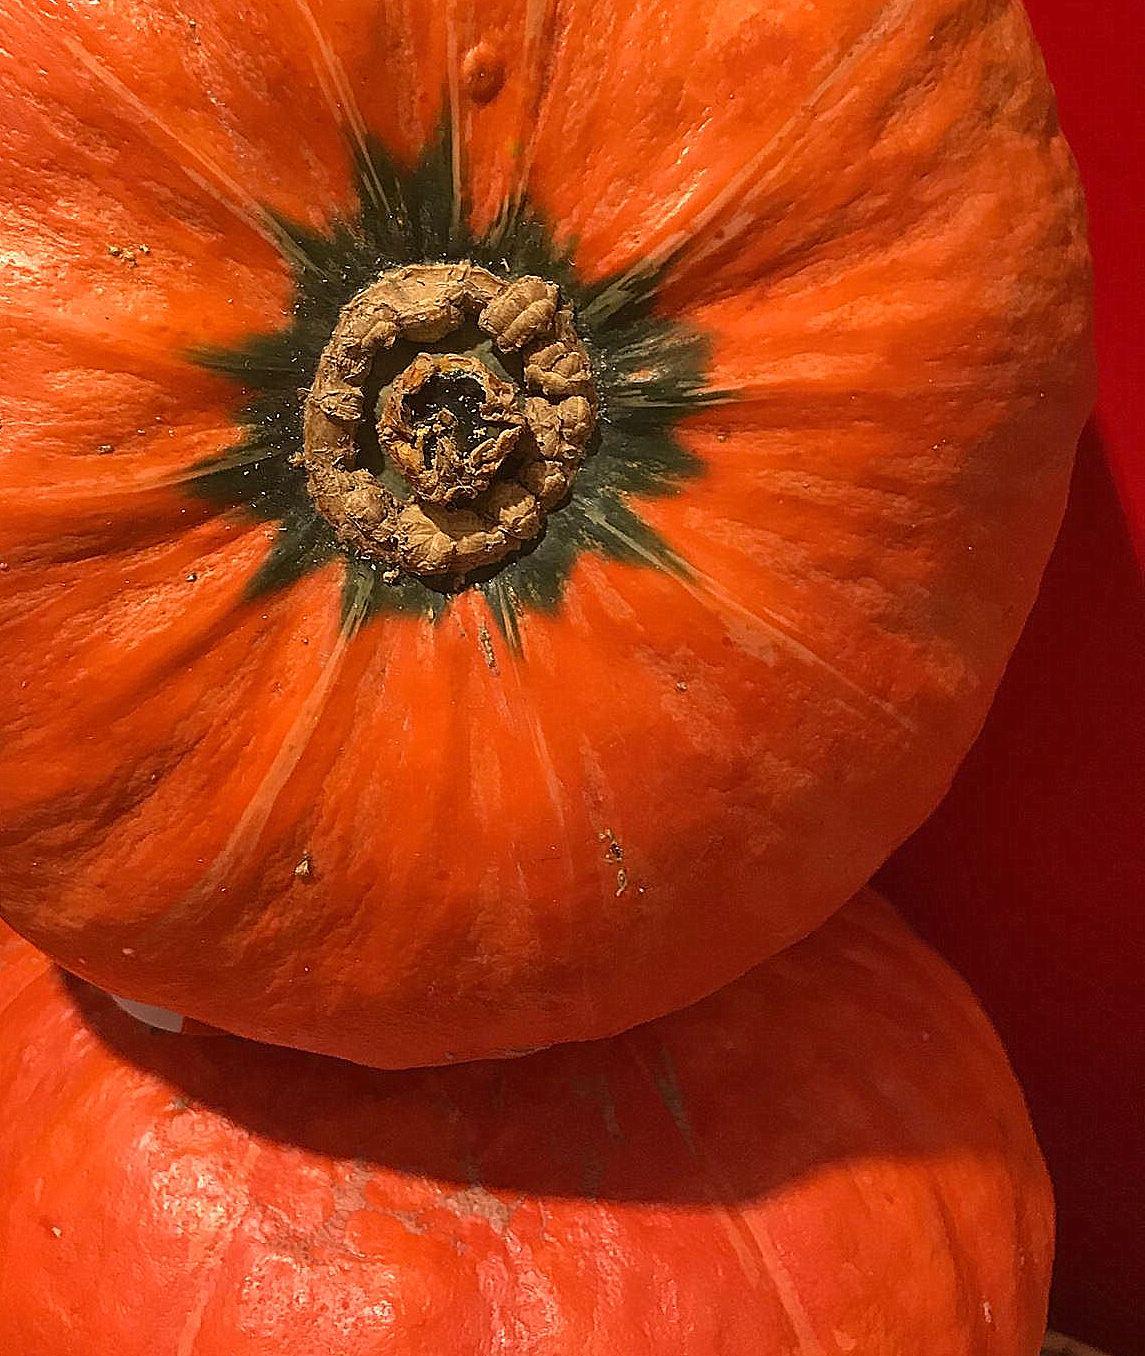 the autumn fruit of pumpkin